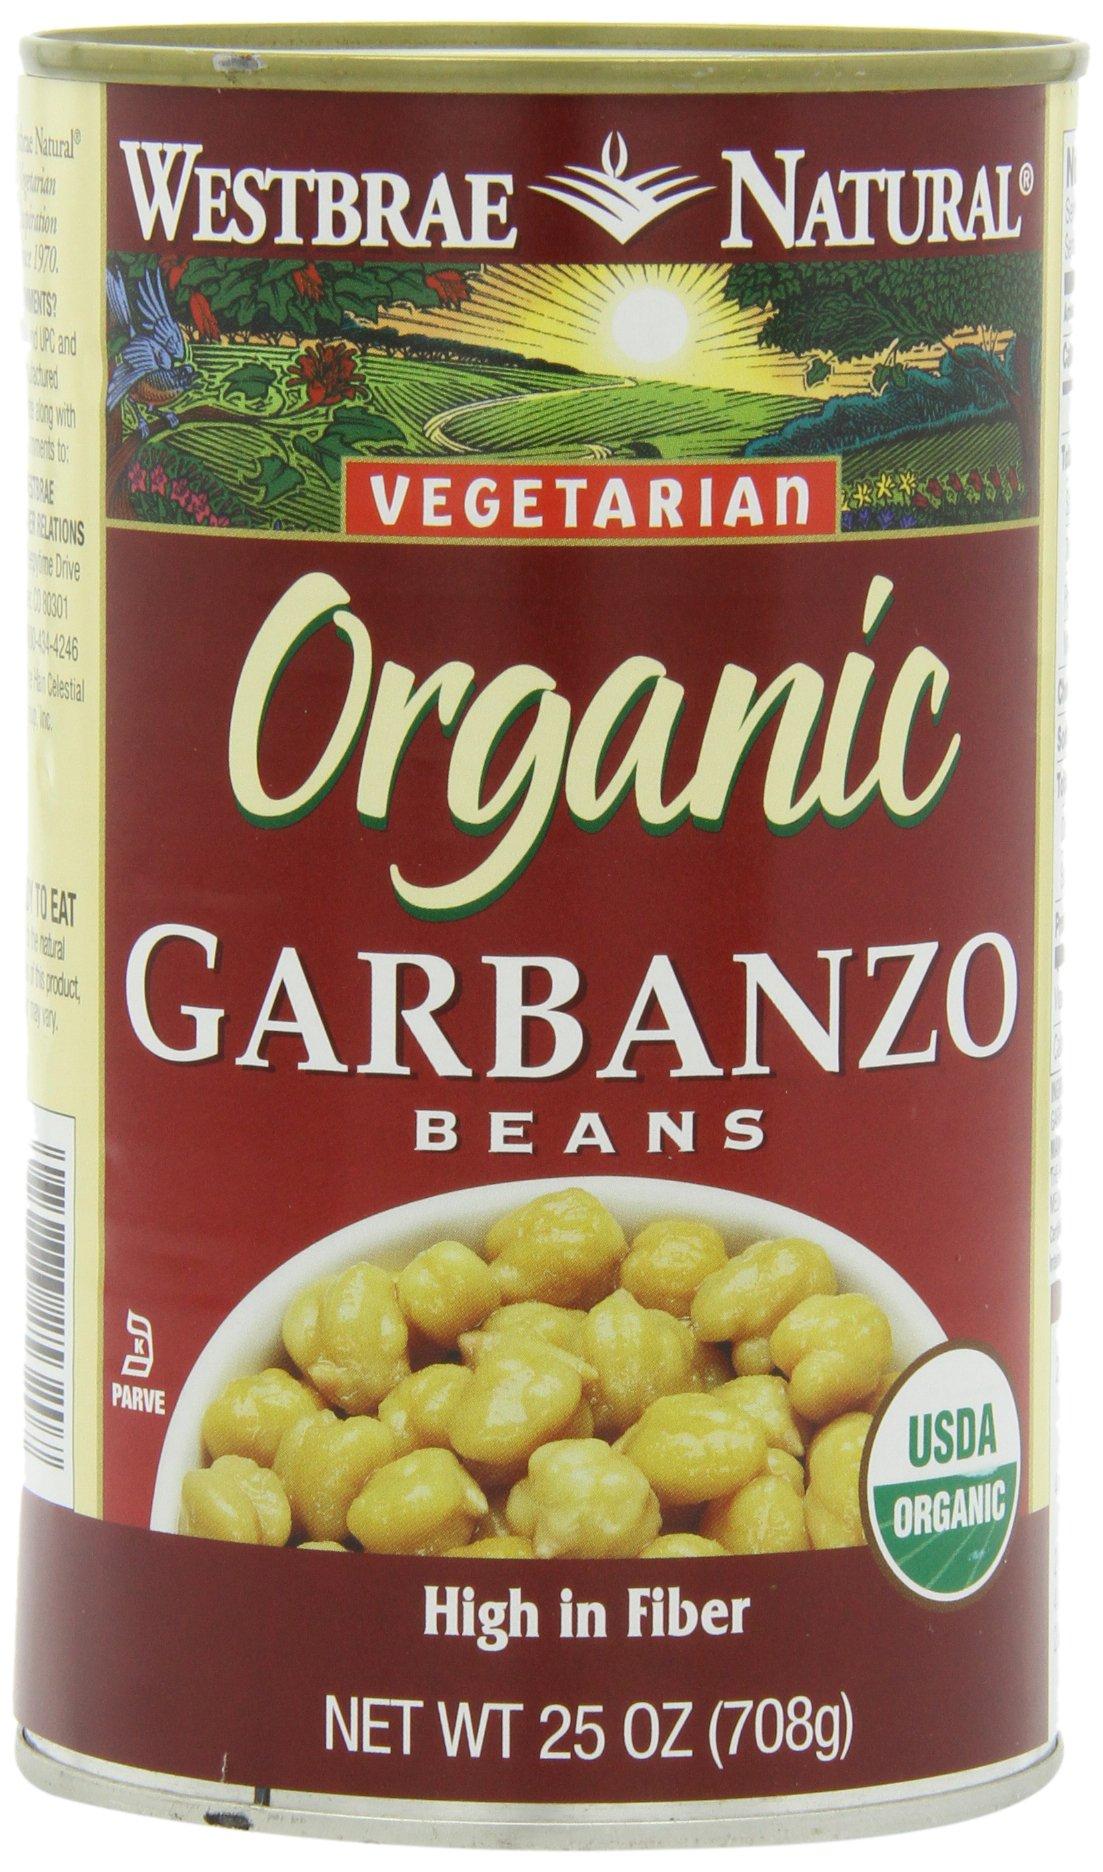 Westbrae Garbanzo Beans, Organic, 25-Ounce (Pack of 6)